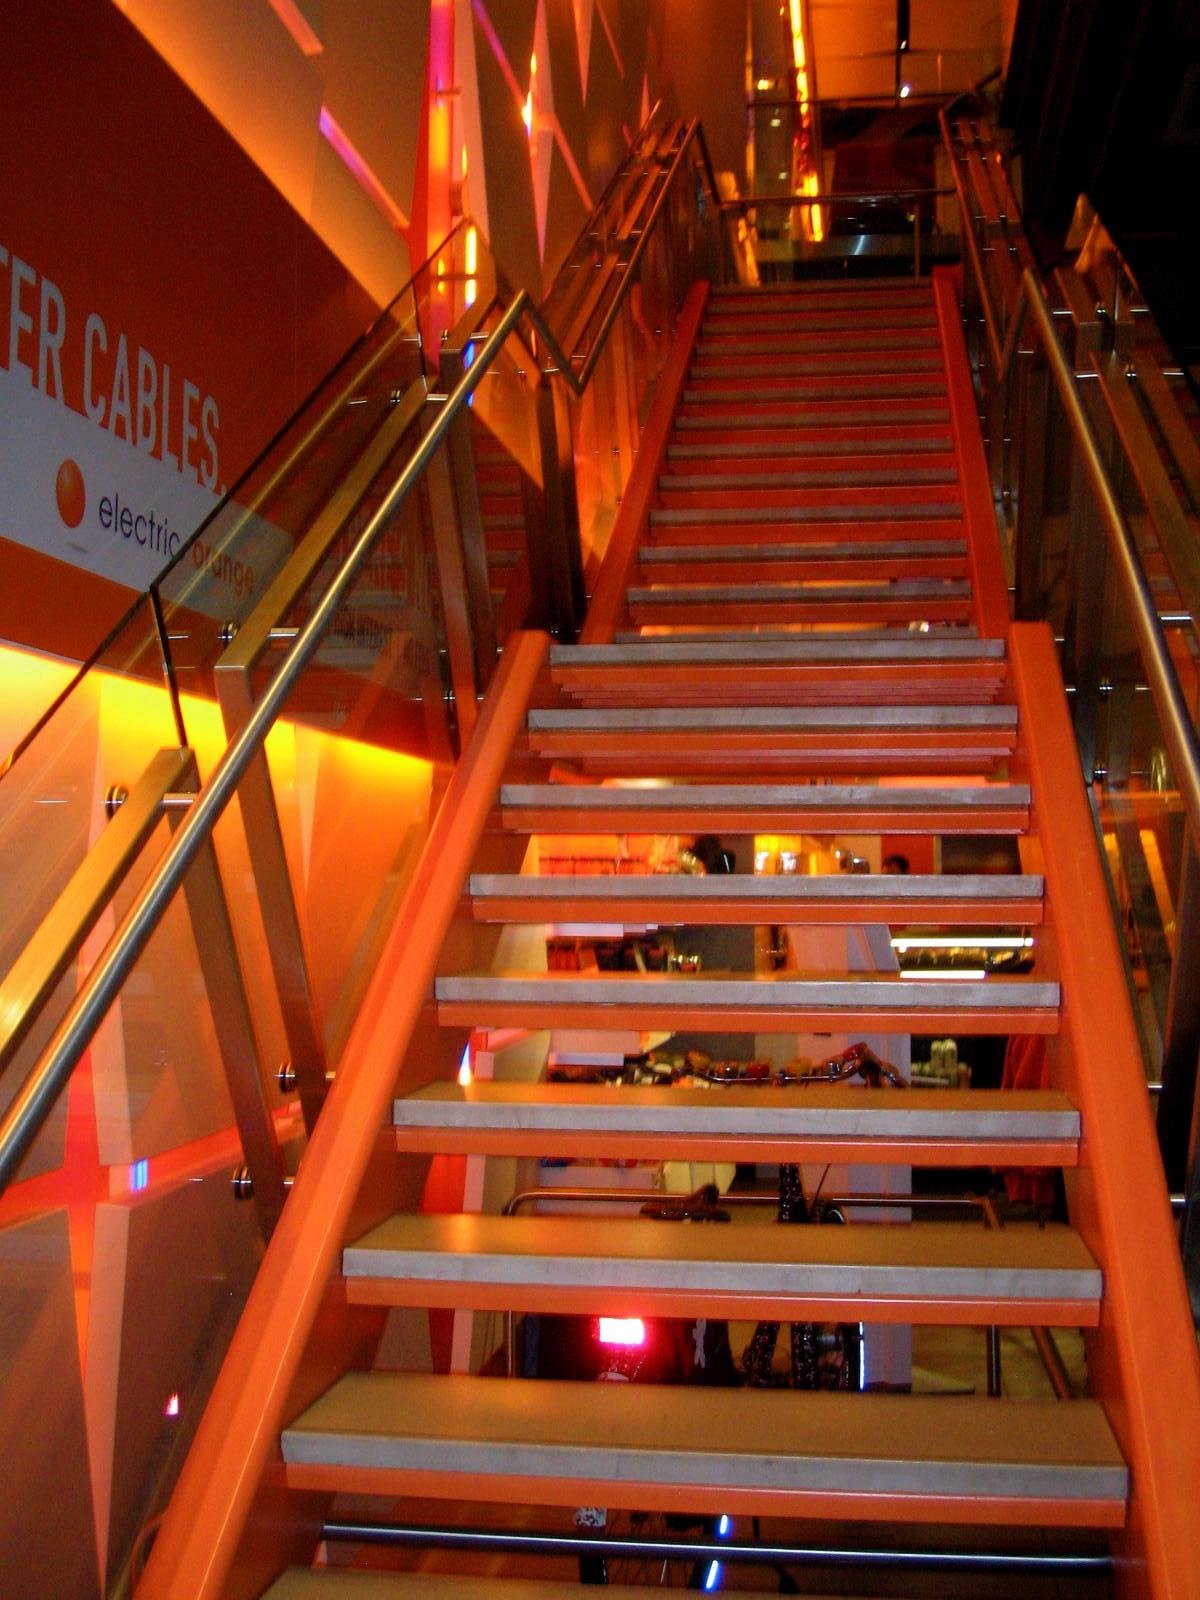 jodi sh doff  : onlythejodi : apples oranges : ING Direct stairway to heaven